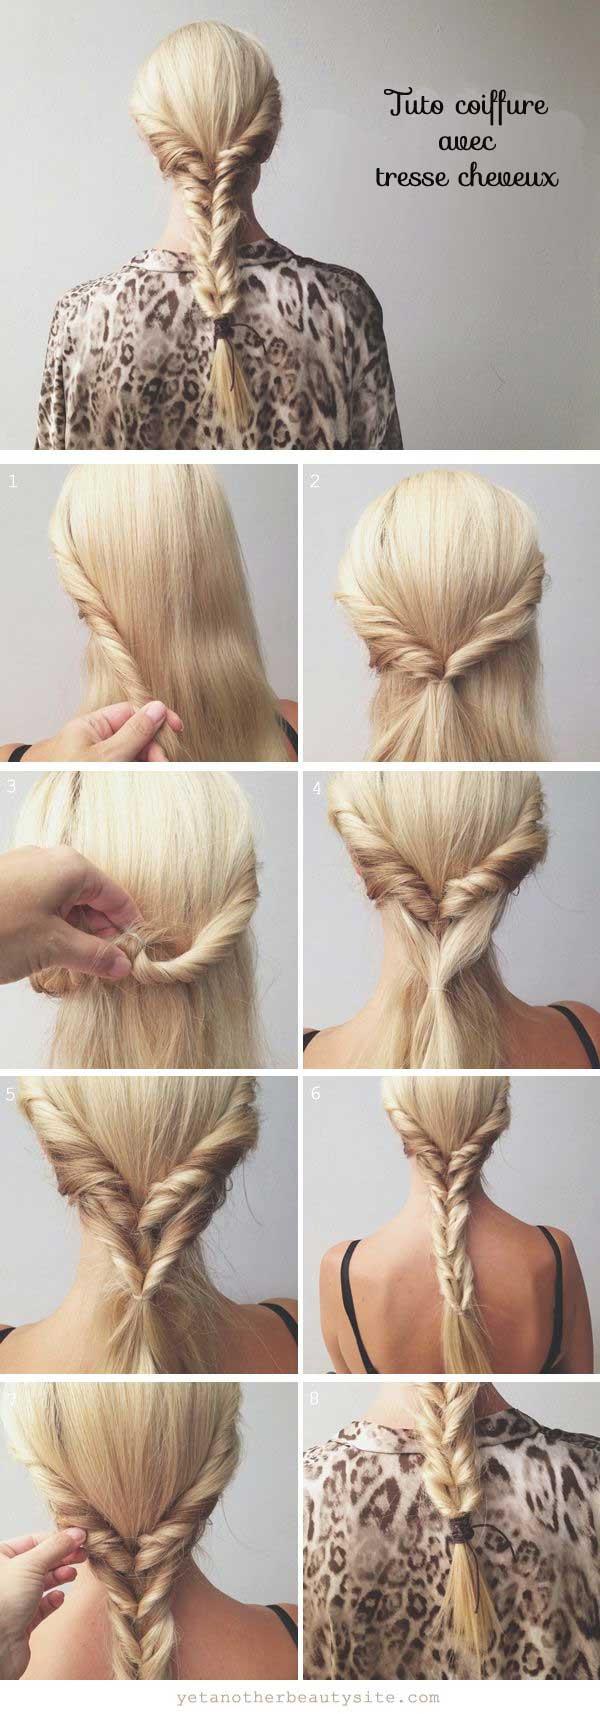 tuto-coiffure-avec-tresse-cheveux